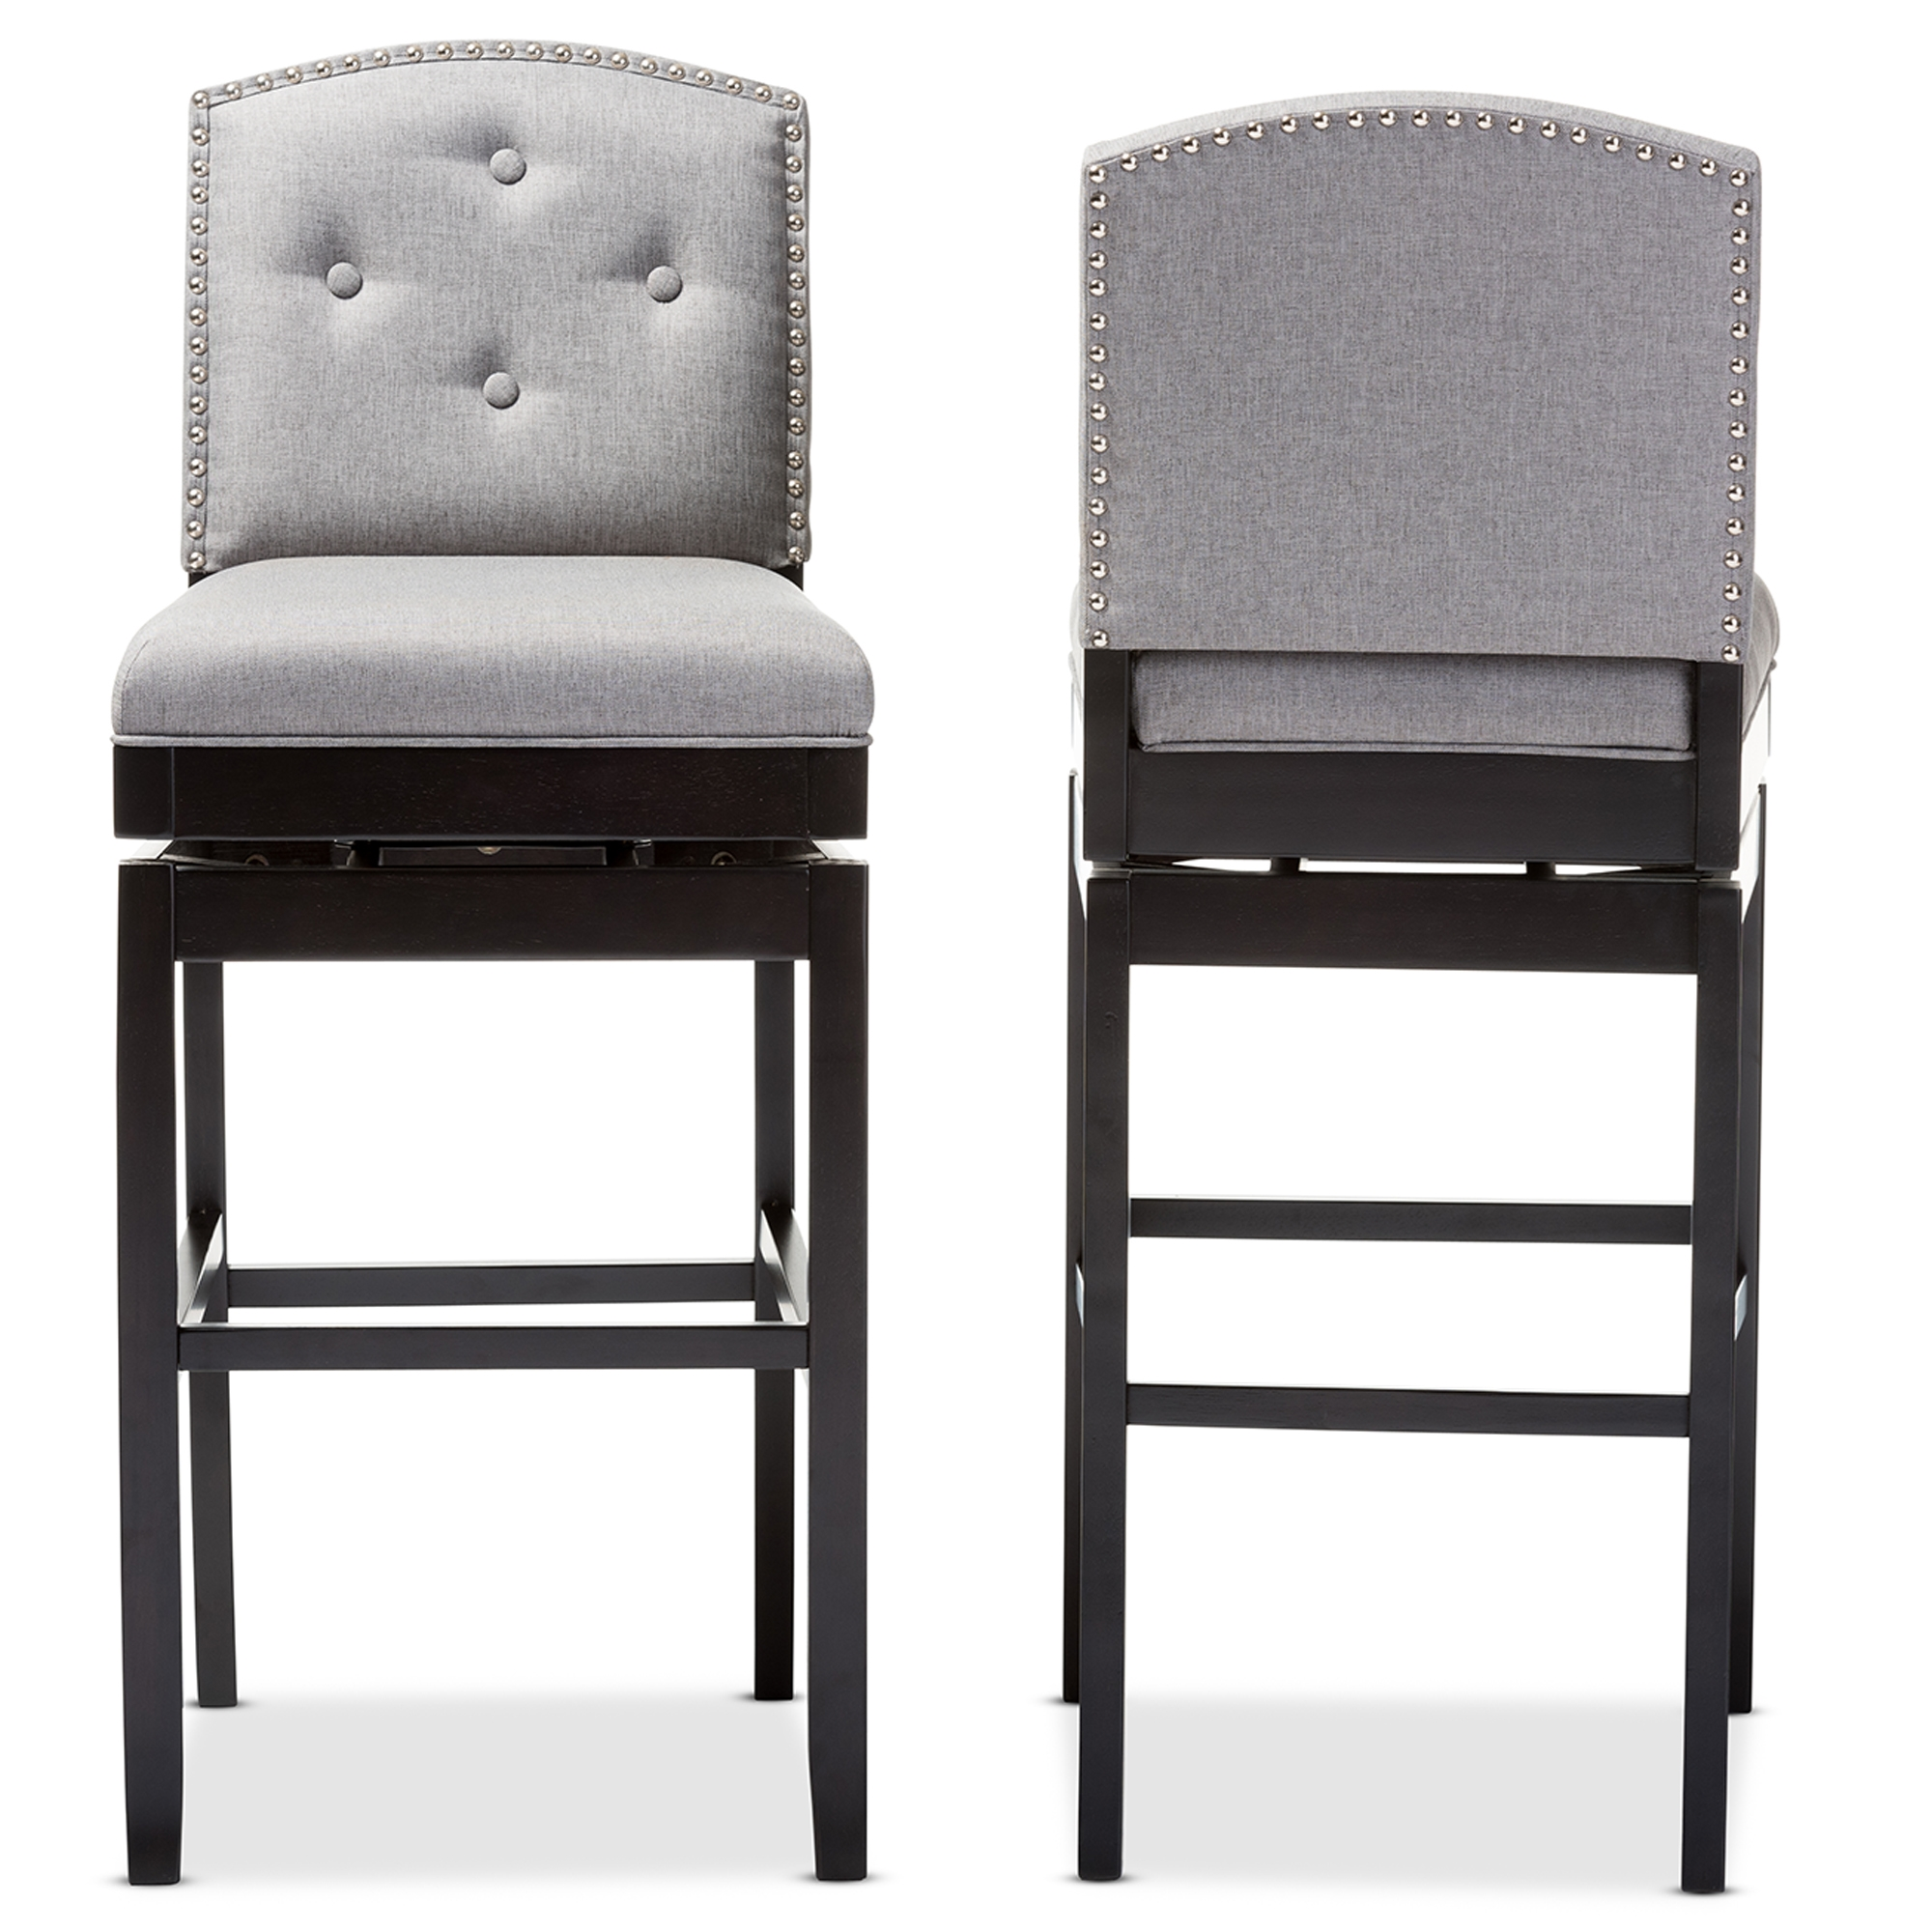 baxton studio wholesale bar stools wholesale bar furniture wholesale furniture